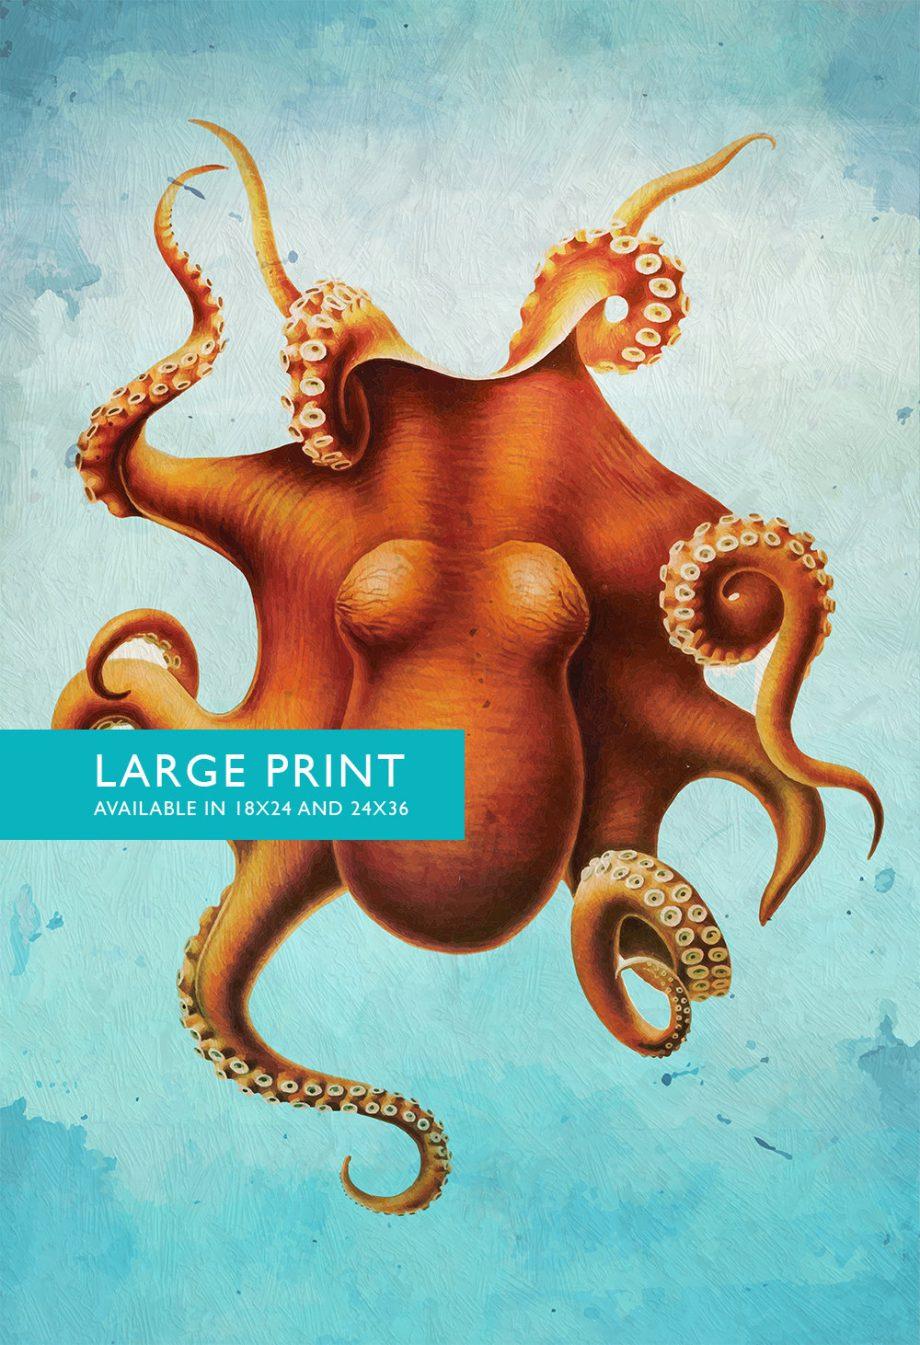 Octopus Art Print Sea Squid 18x24 24x36 Vintage Nautical Decor Ocean Wall Art - Large Giclee Print